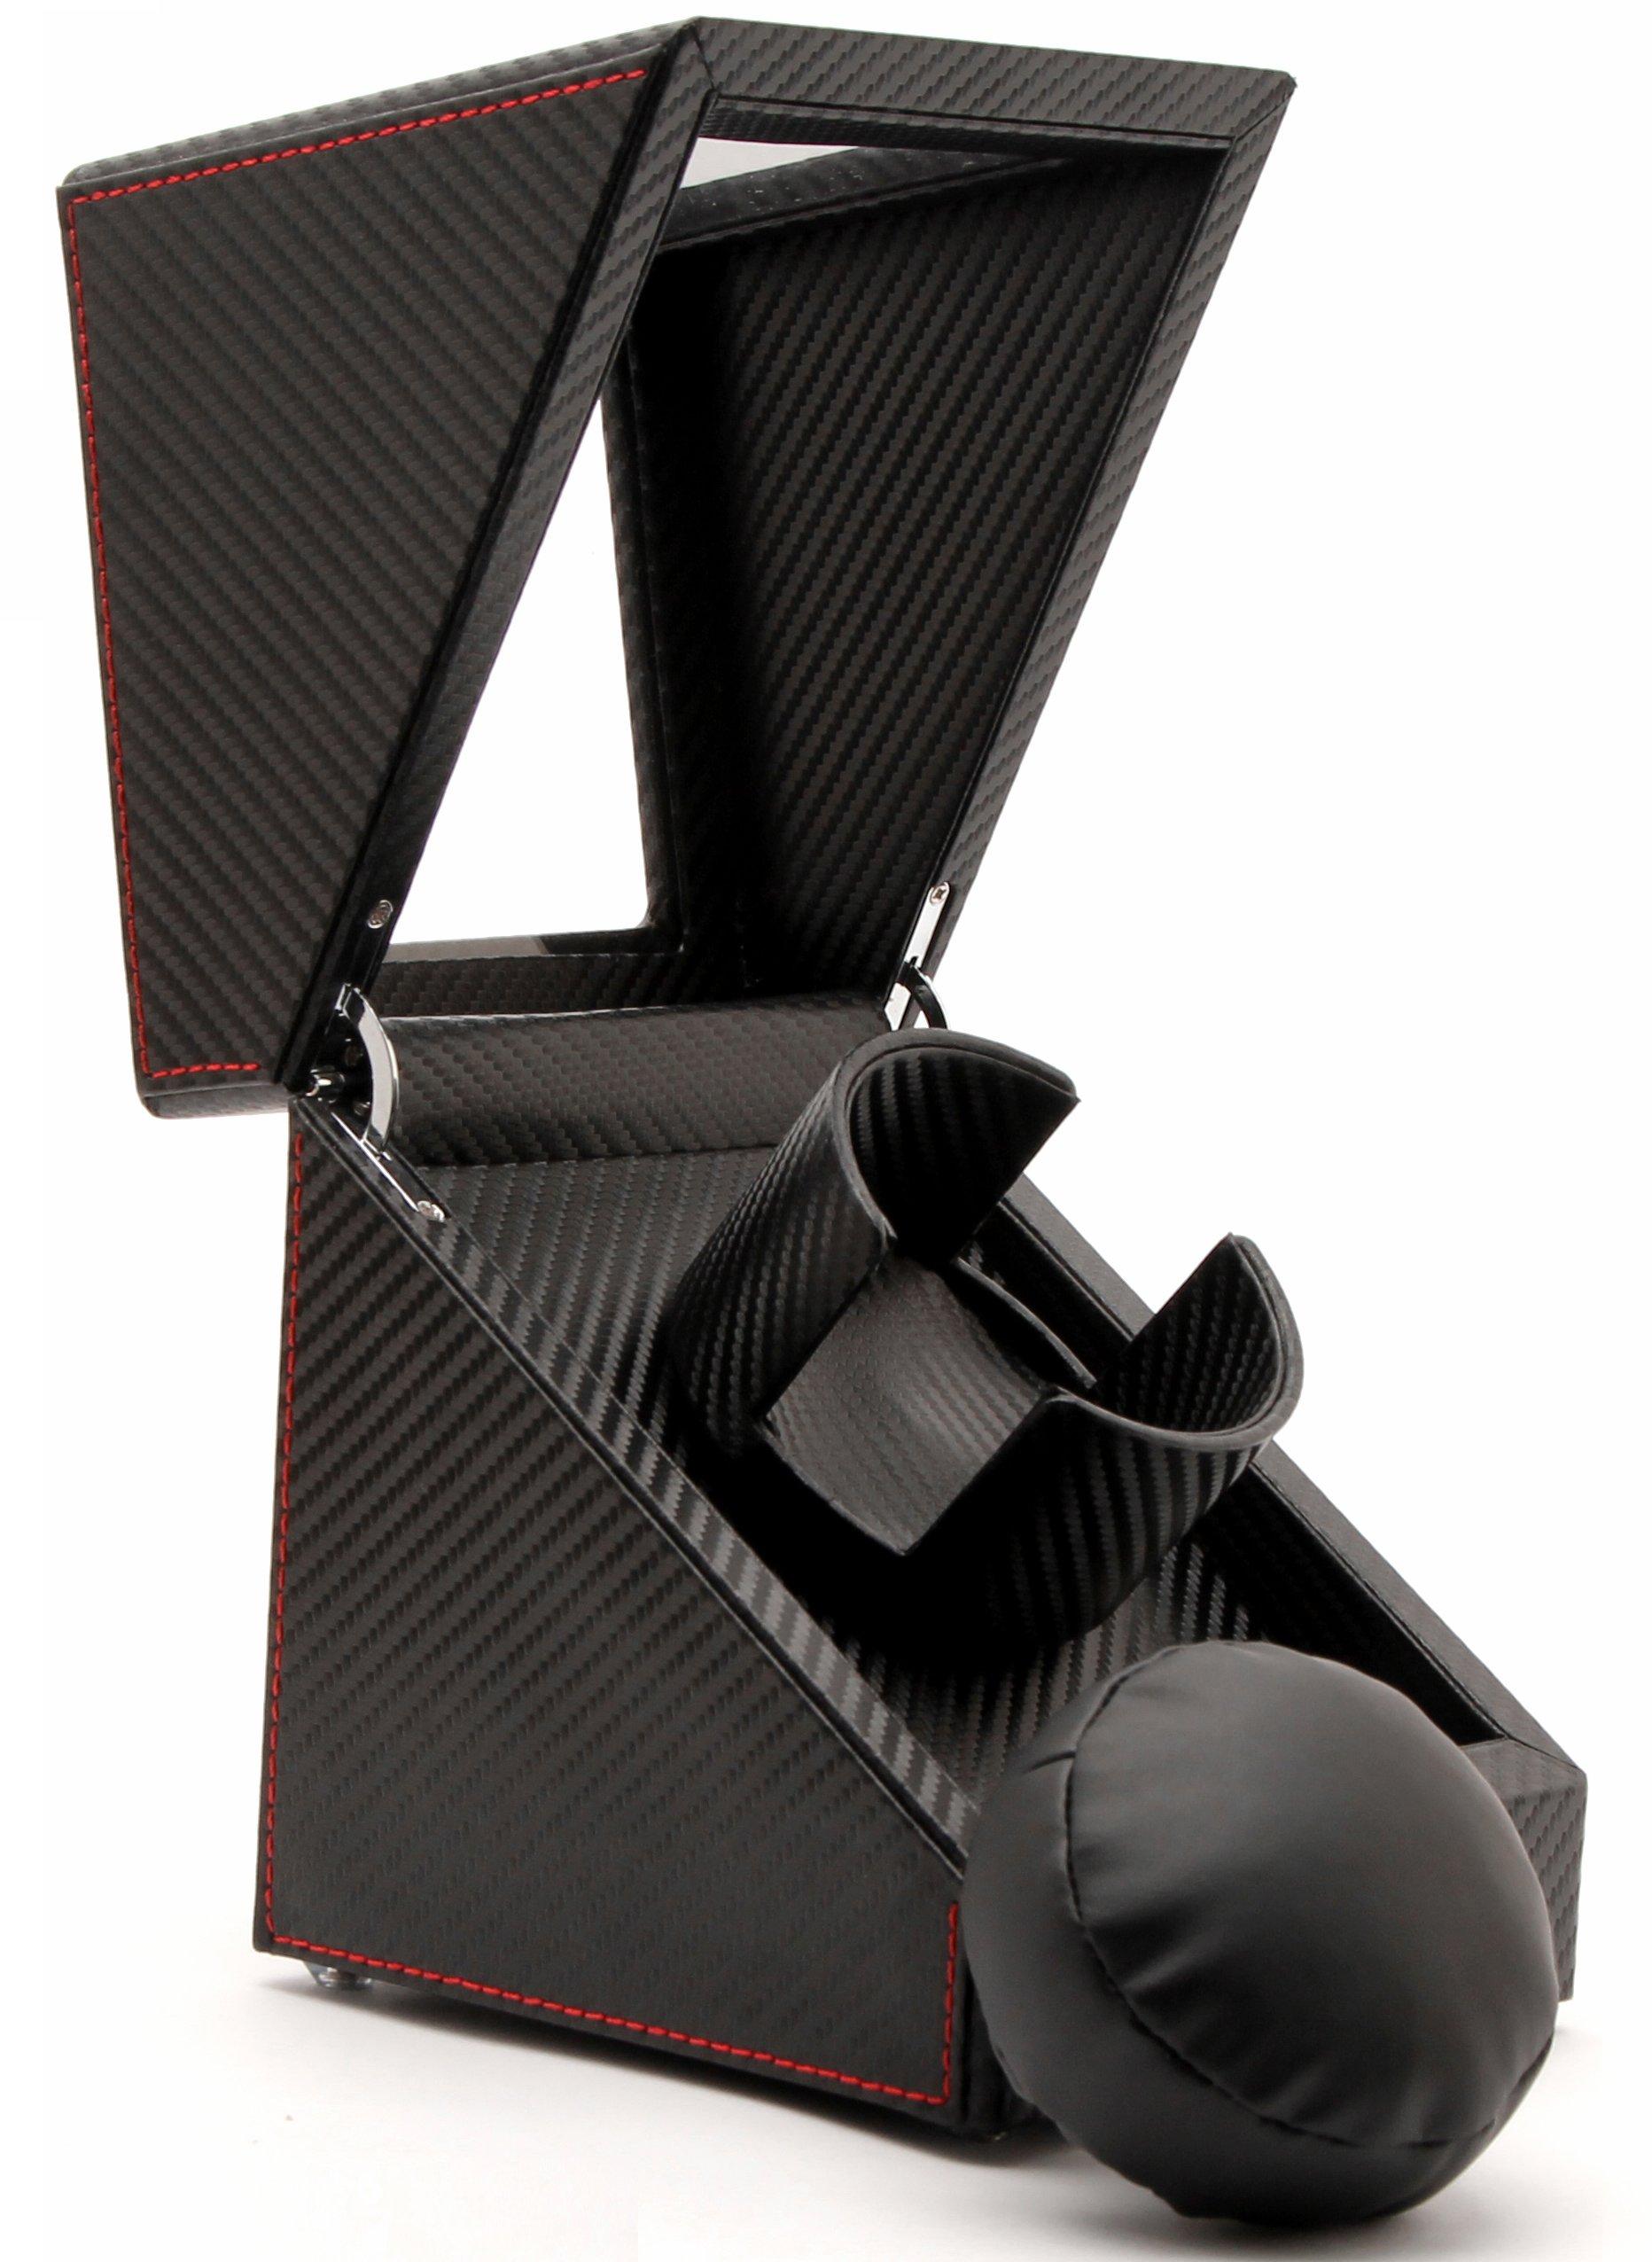 Pateker Luxury Carbon Fiber Single Watch Winder, Black Leather Display Box Case [100% Handmade]